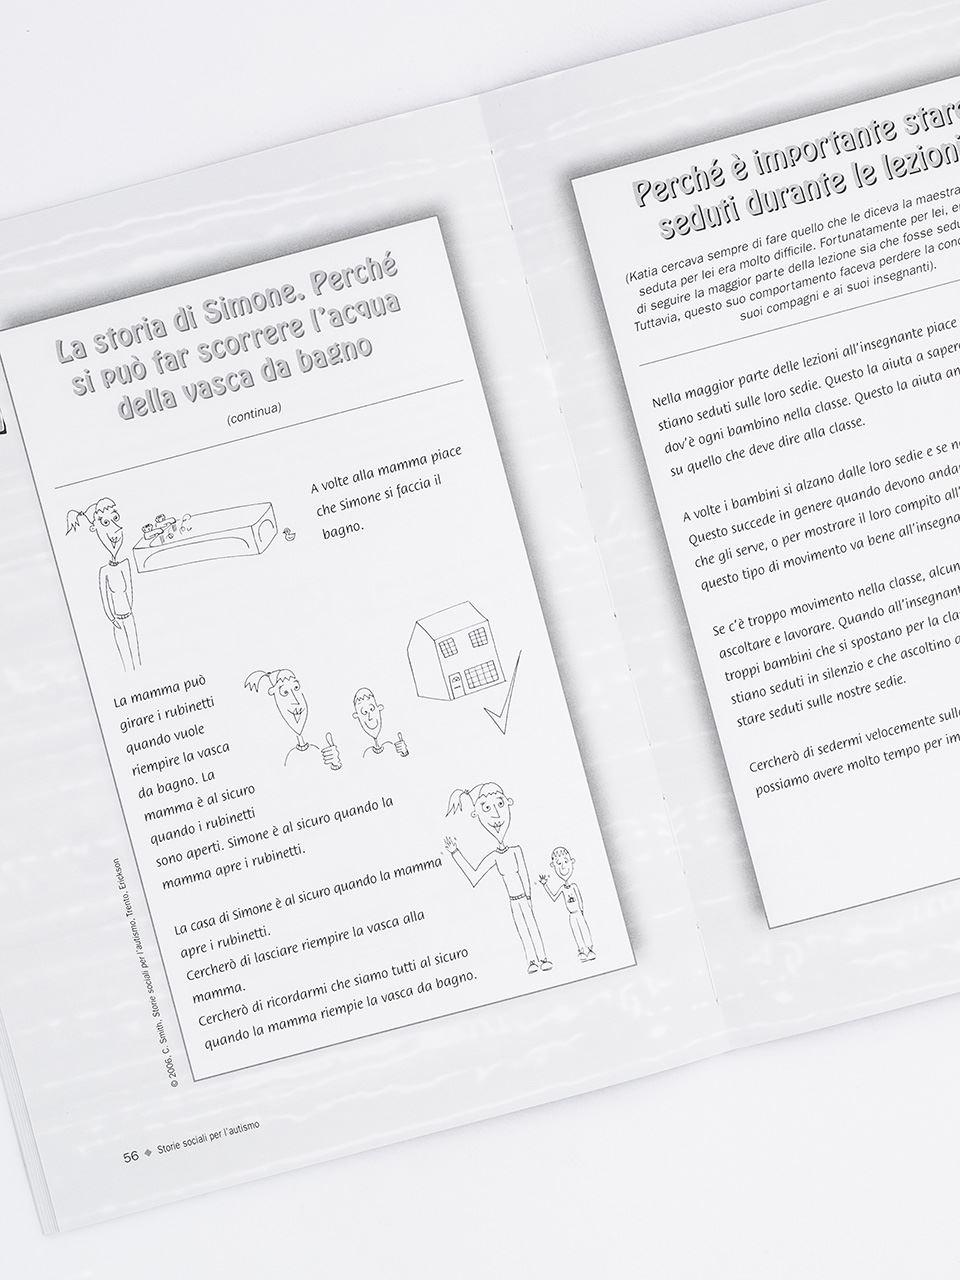 Storie sociali per l'autismo - Libri - Erickson 2